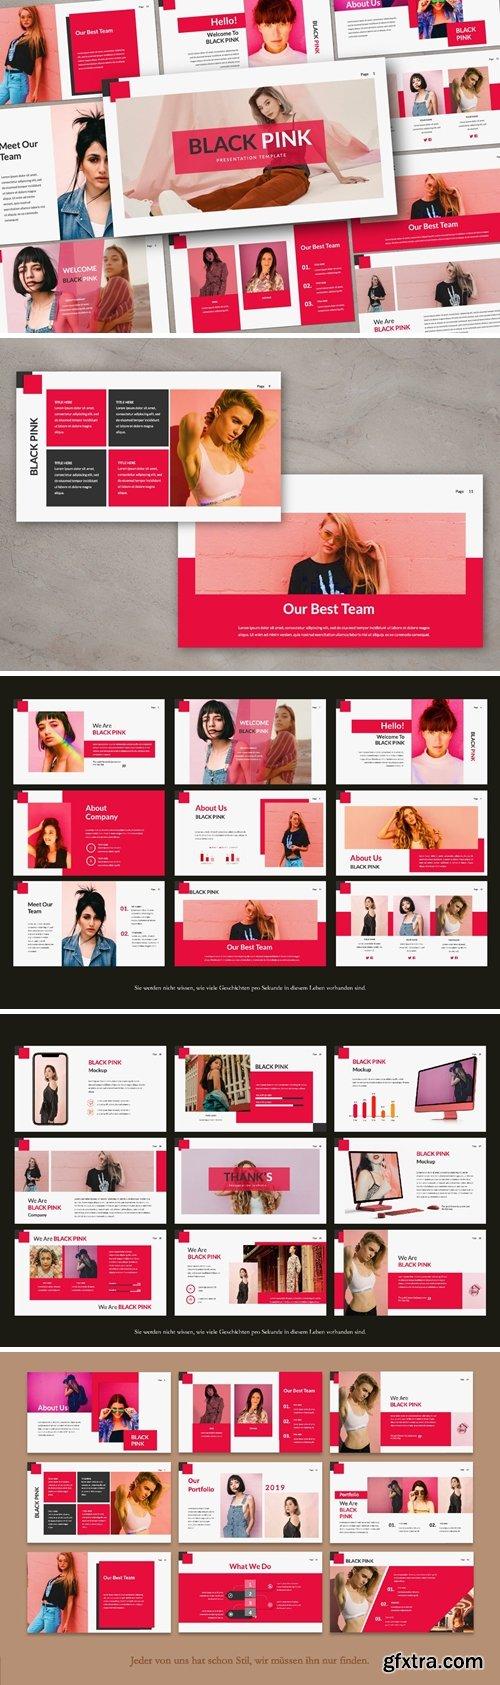 Black Pink Presentation Powerpoint, Keynote and Google Slides Templates